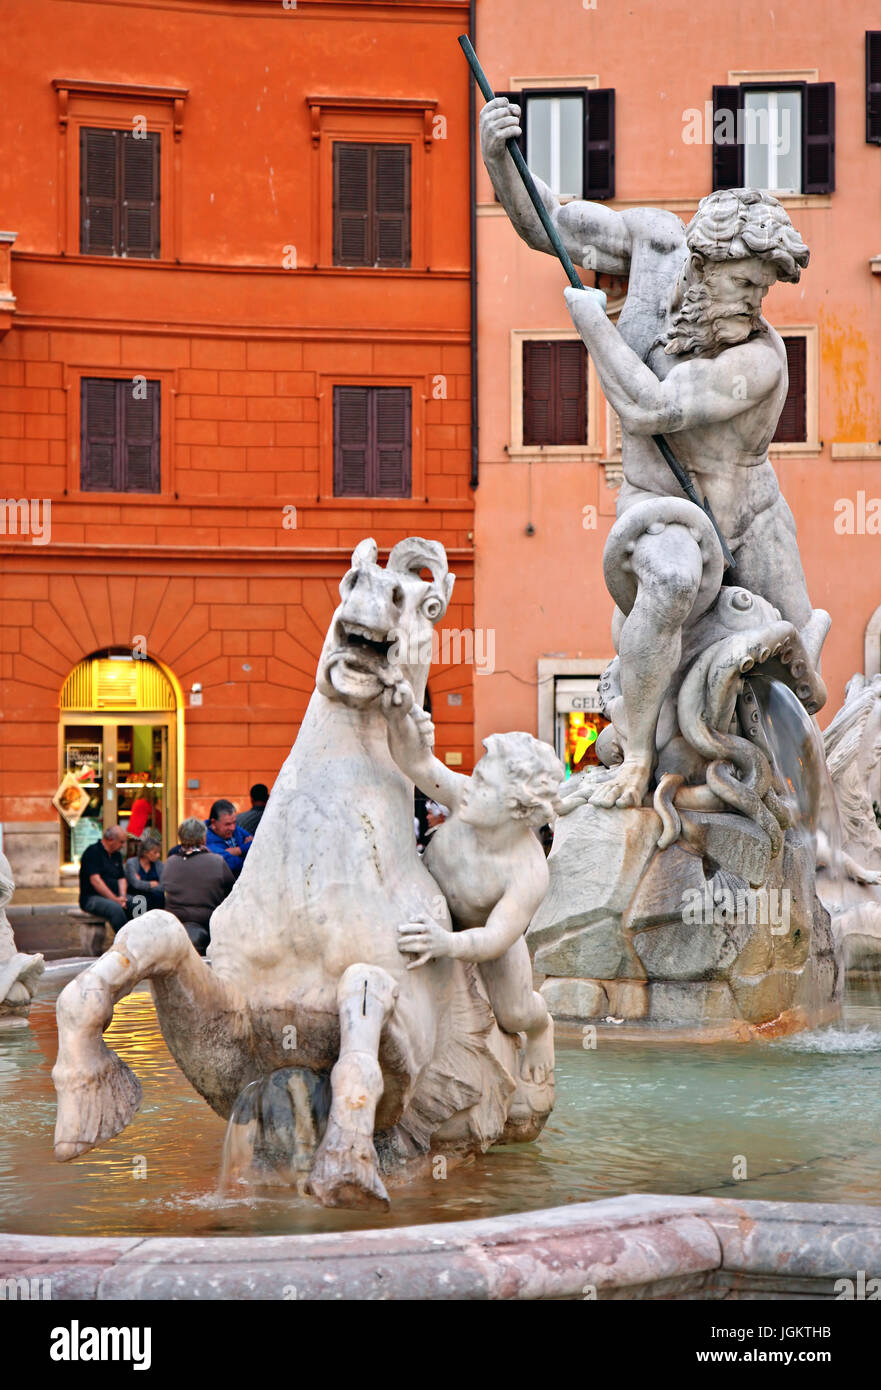 'Detail' from Fontana del Nettuno (Fountain of Neptune), Piazza Navona, Rome, Italy - Stock Image